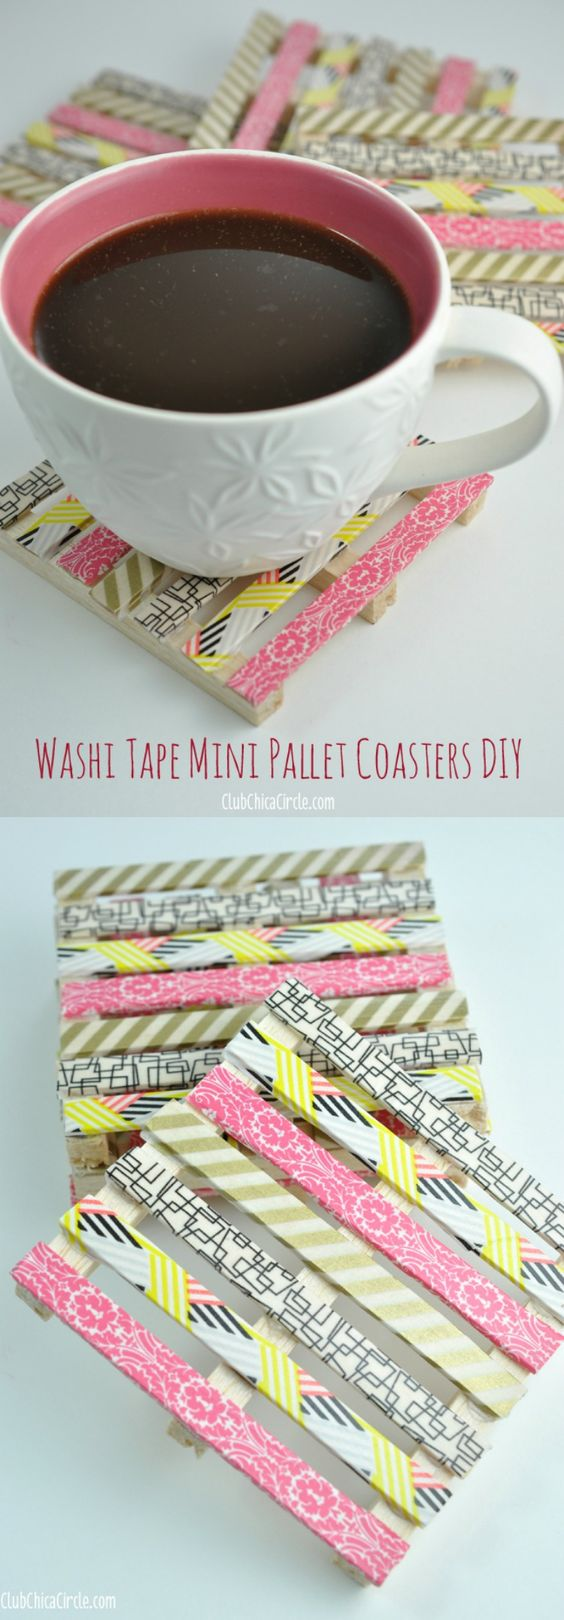 Washi Tape Mini Wood Pallet DIY Coasters.